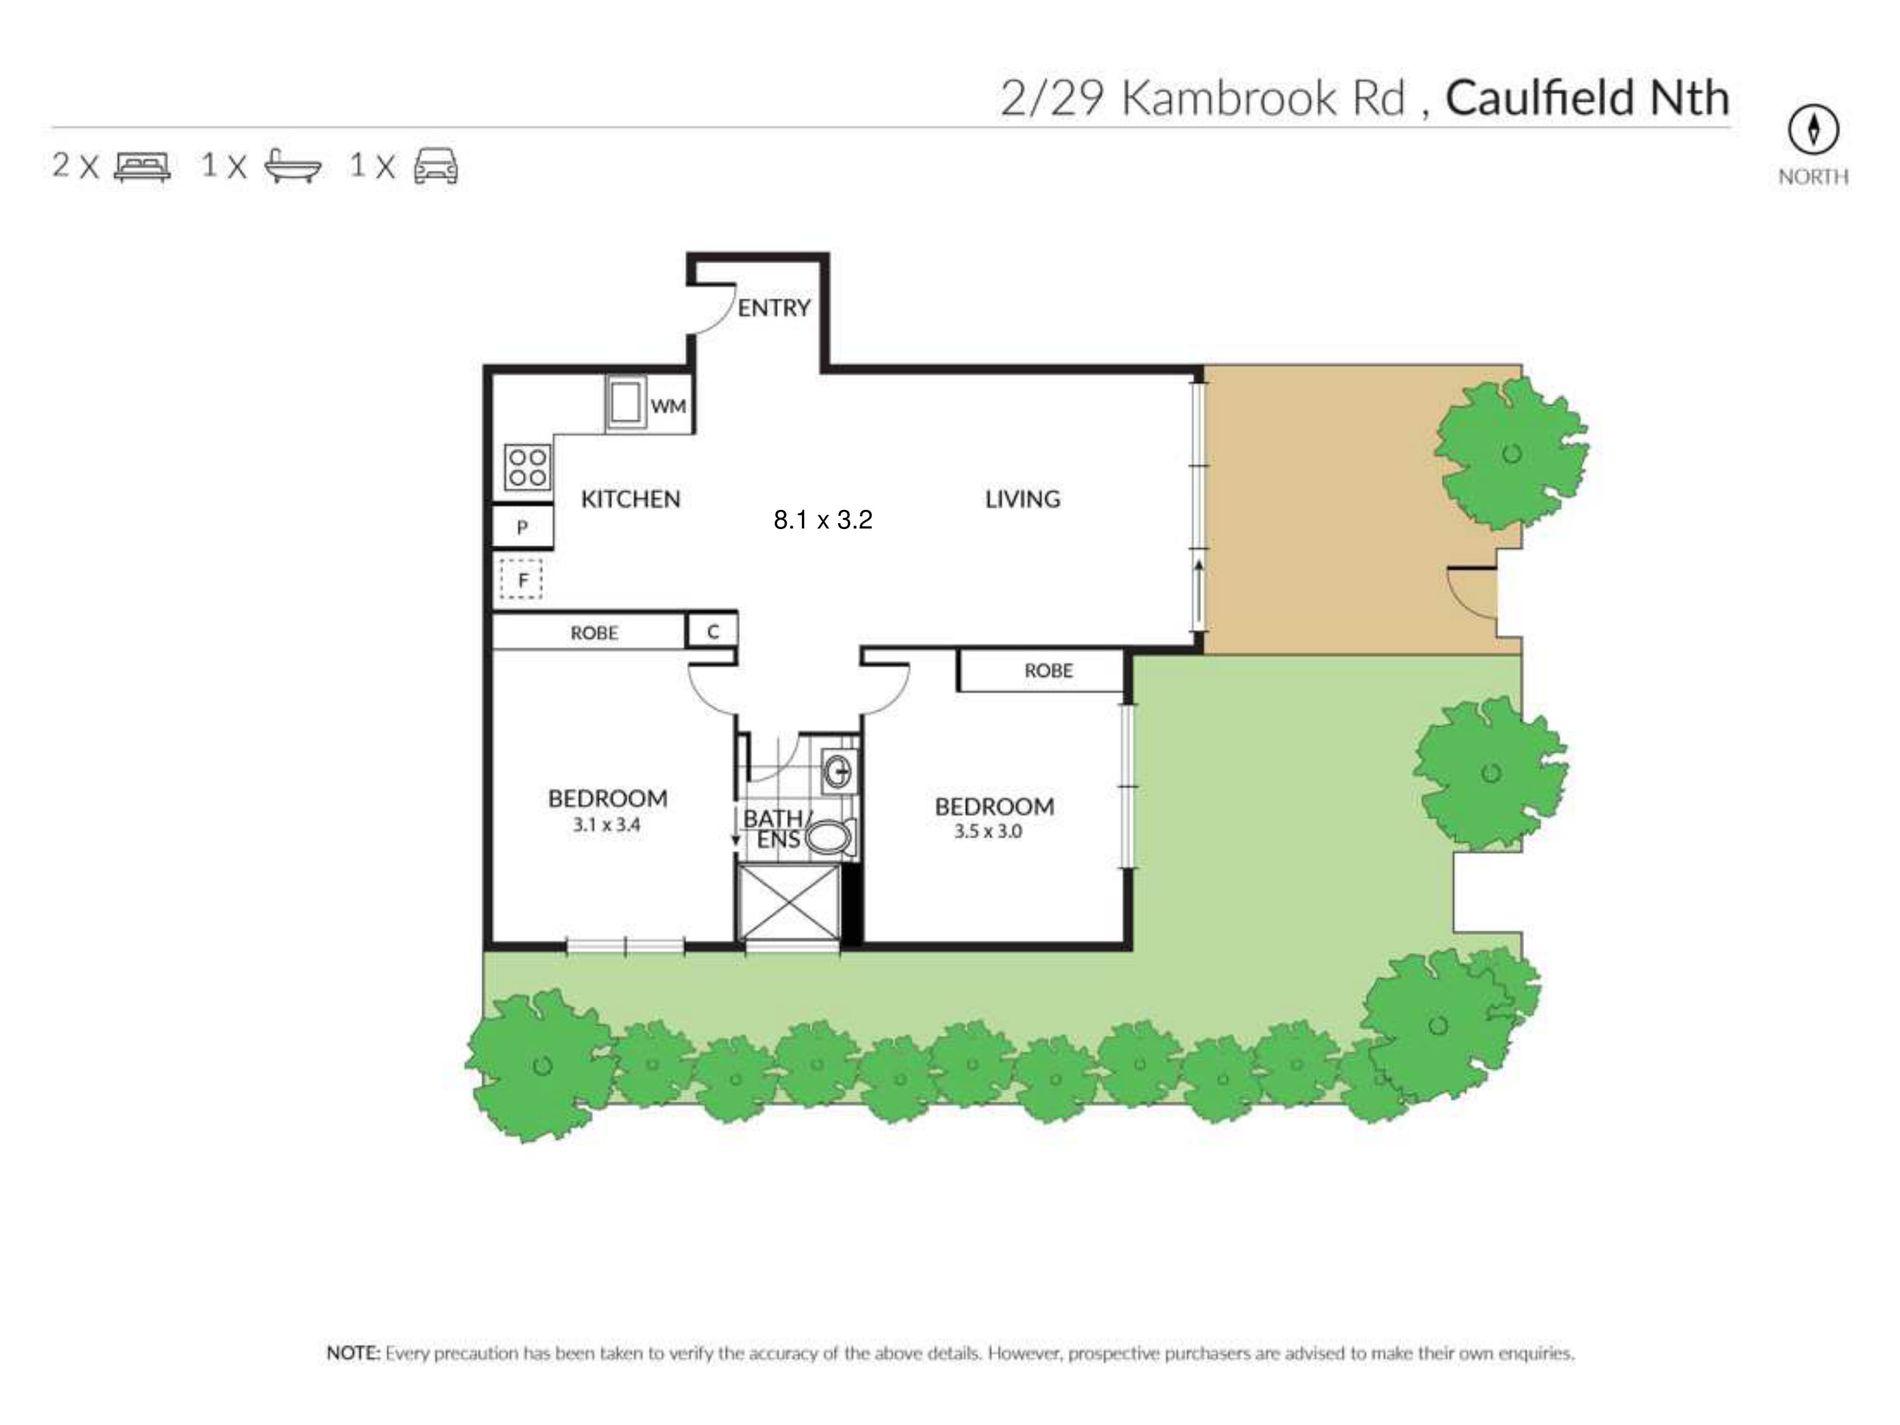 2 / 29 Kambrook Road, Caulfield North